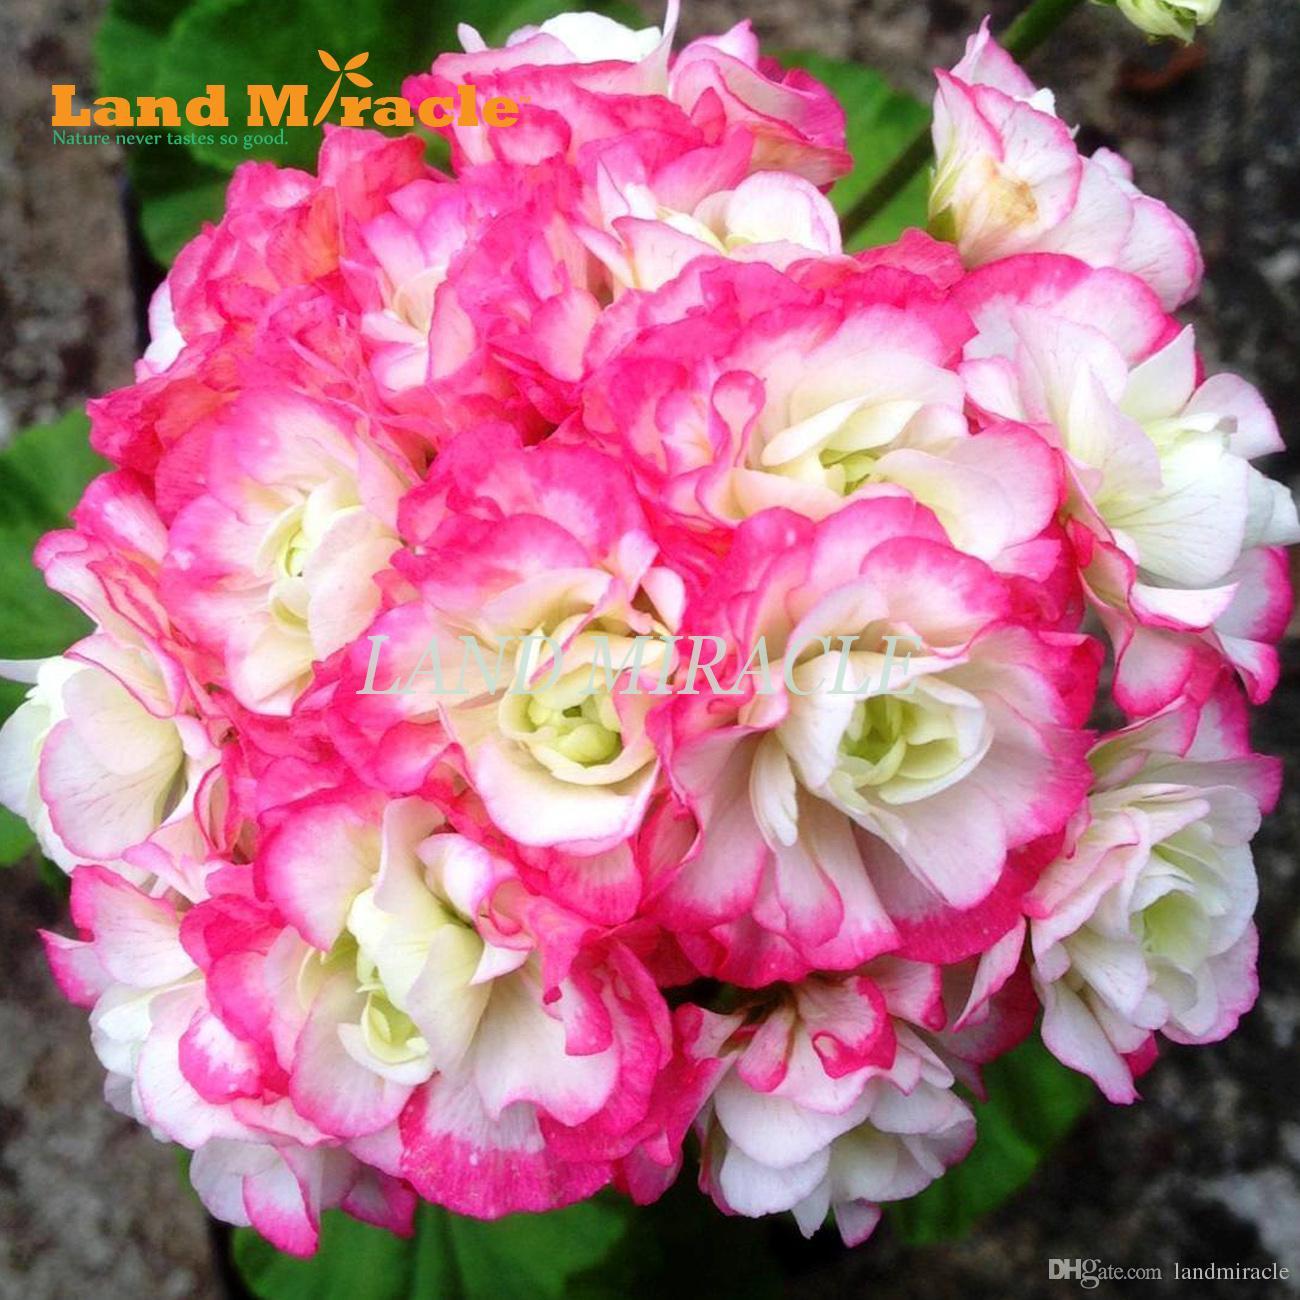 2019 Two Color Geranium Perennial Flower Seeds 5 Seeds Big Blooms